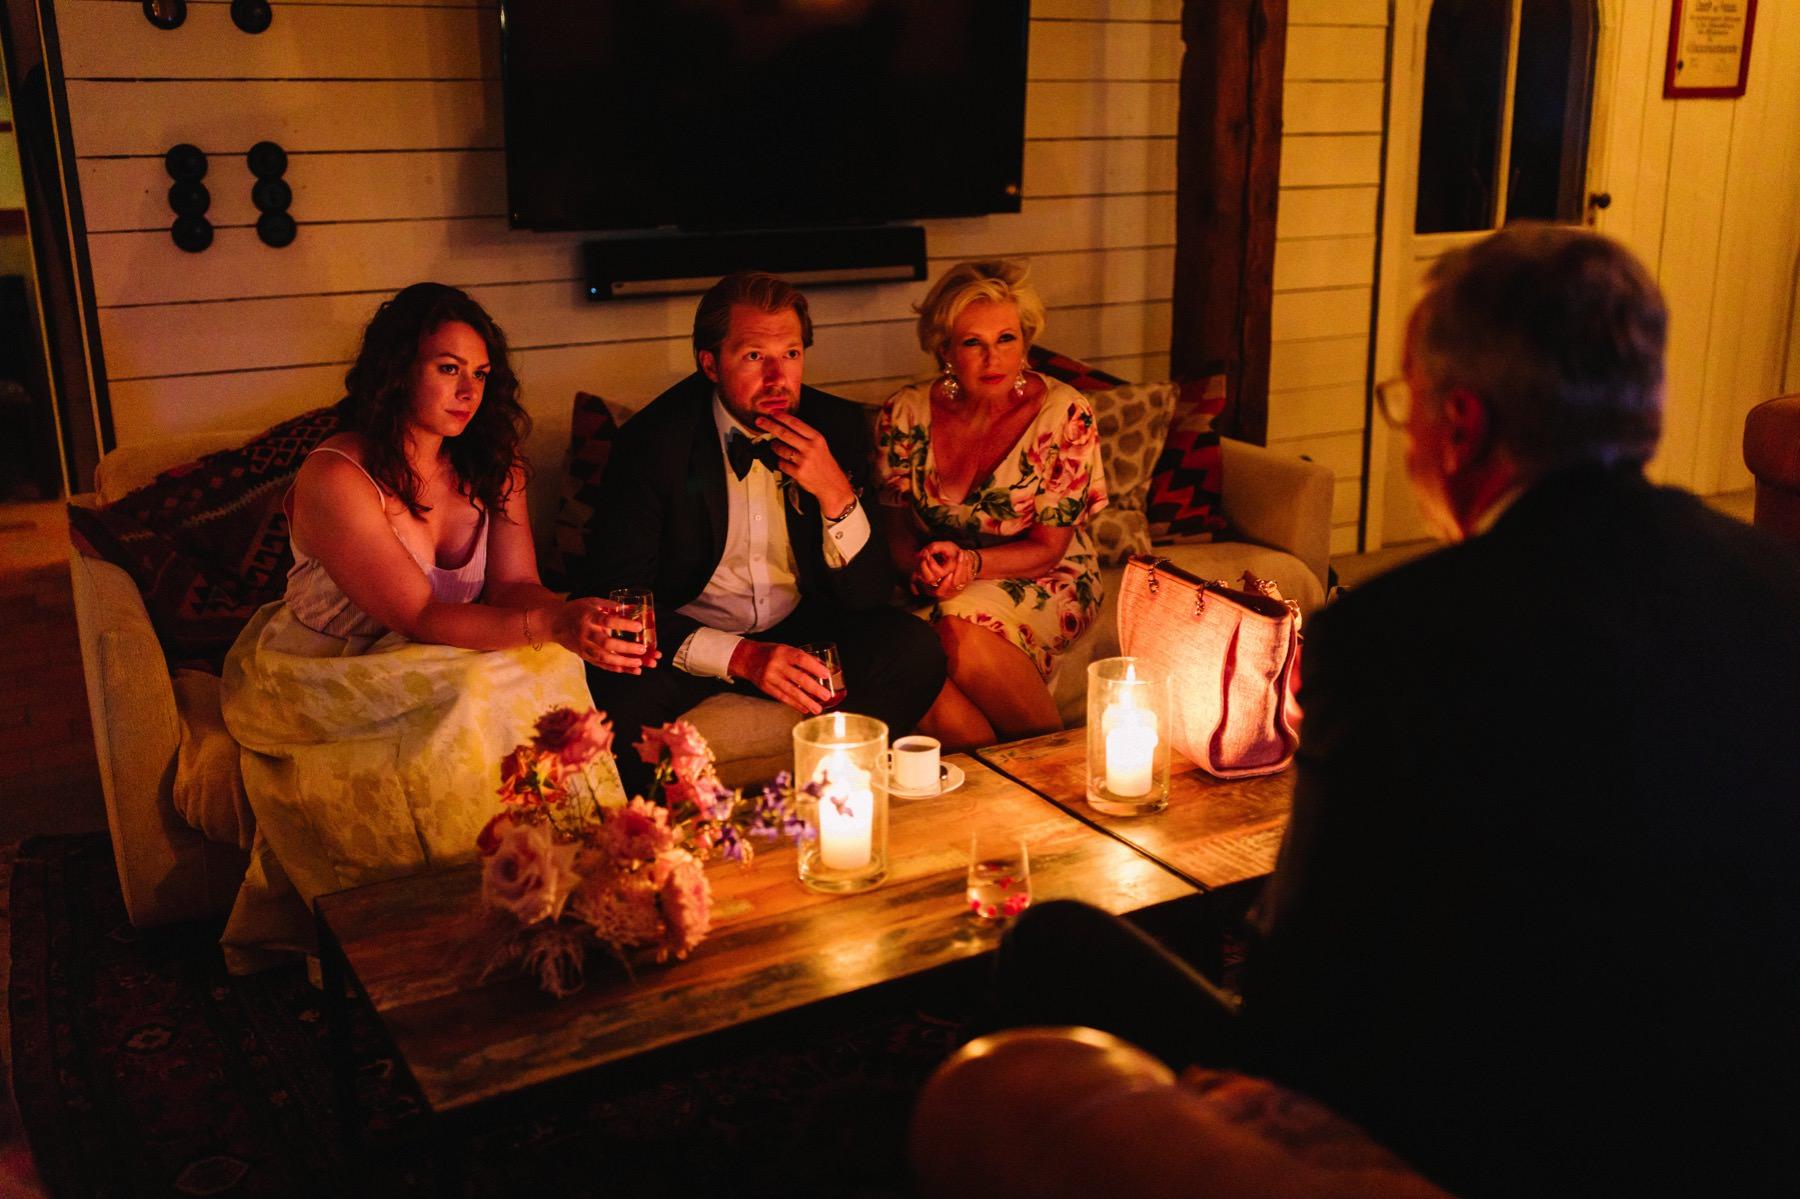 wedding night atmosphere